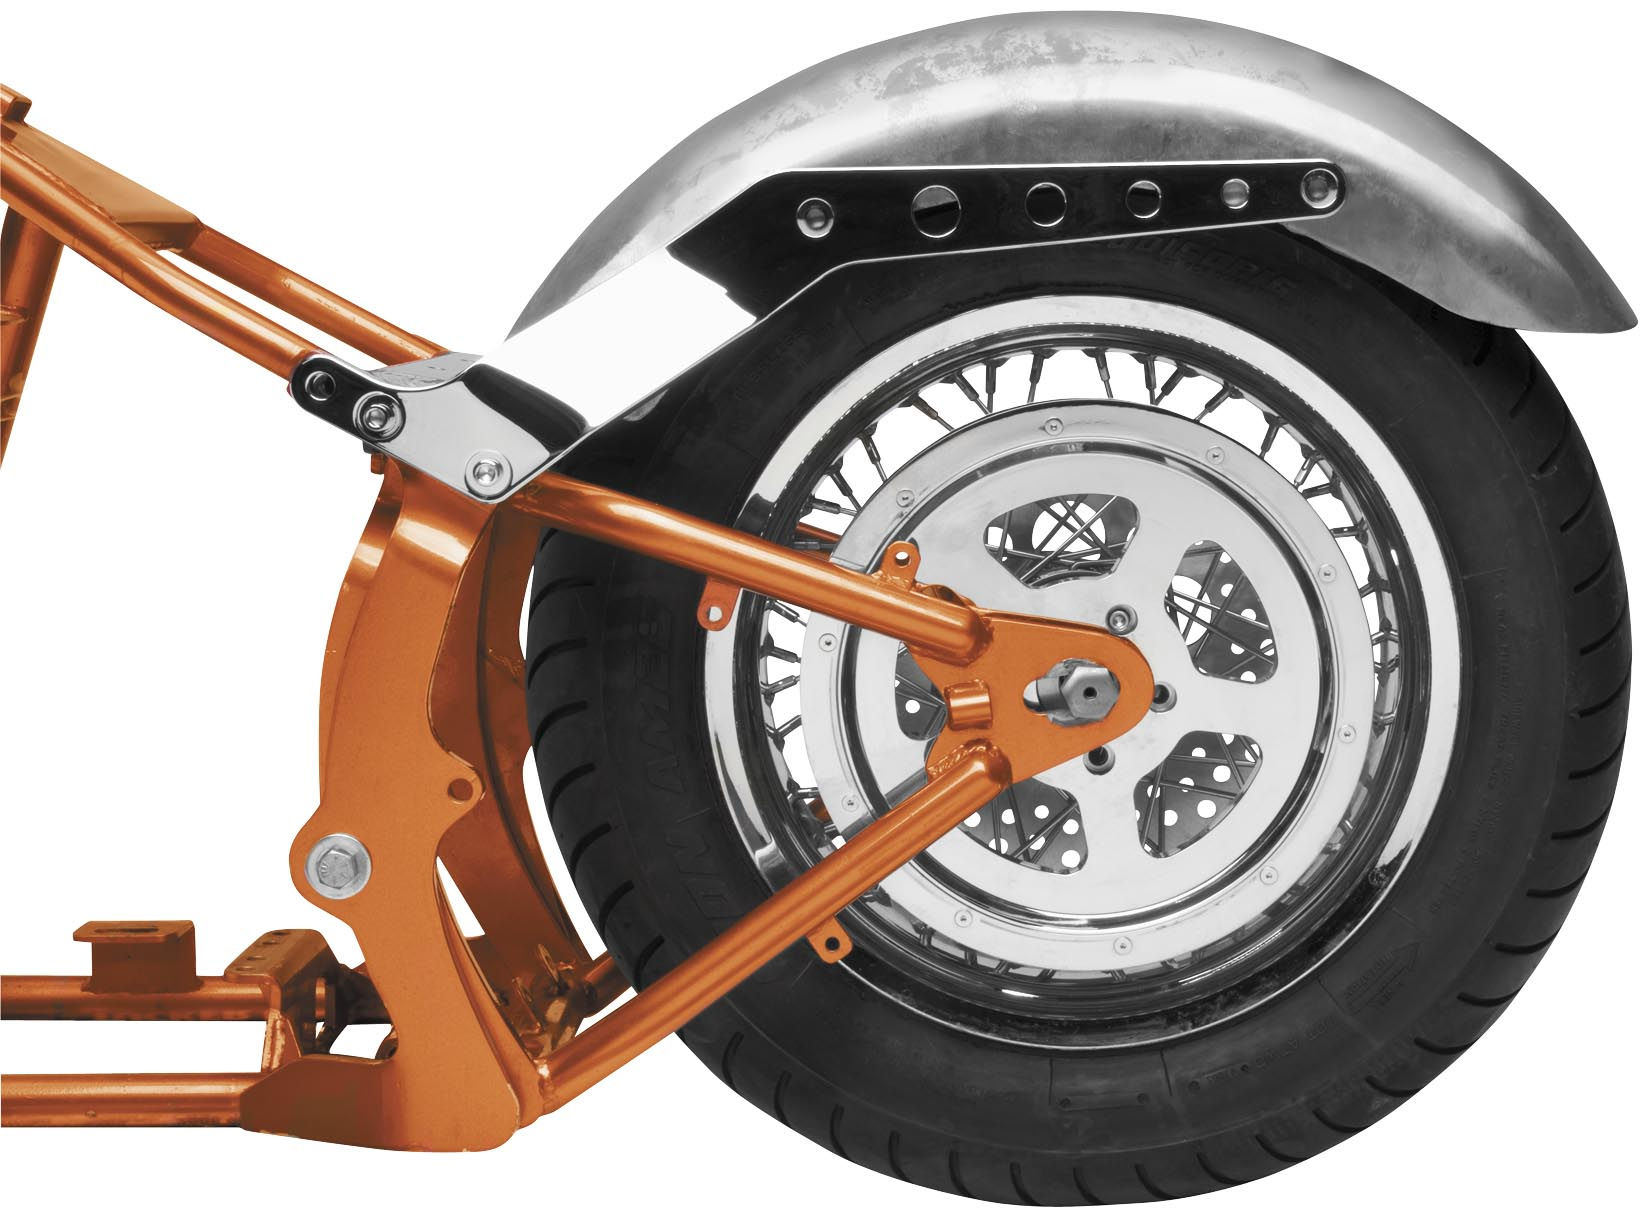 Biker's Choice Custom Rear Fender | Team Straus Motorcycles